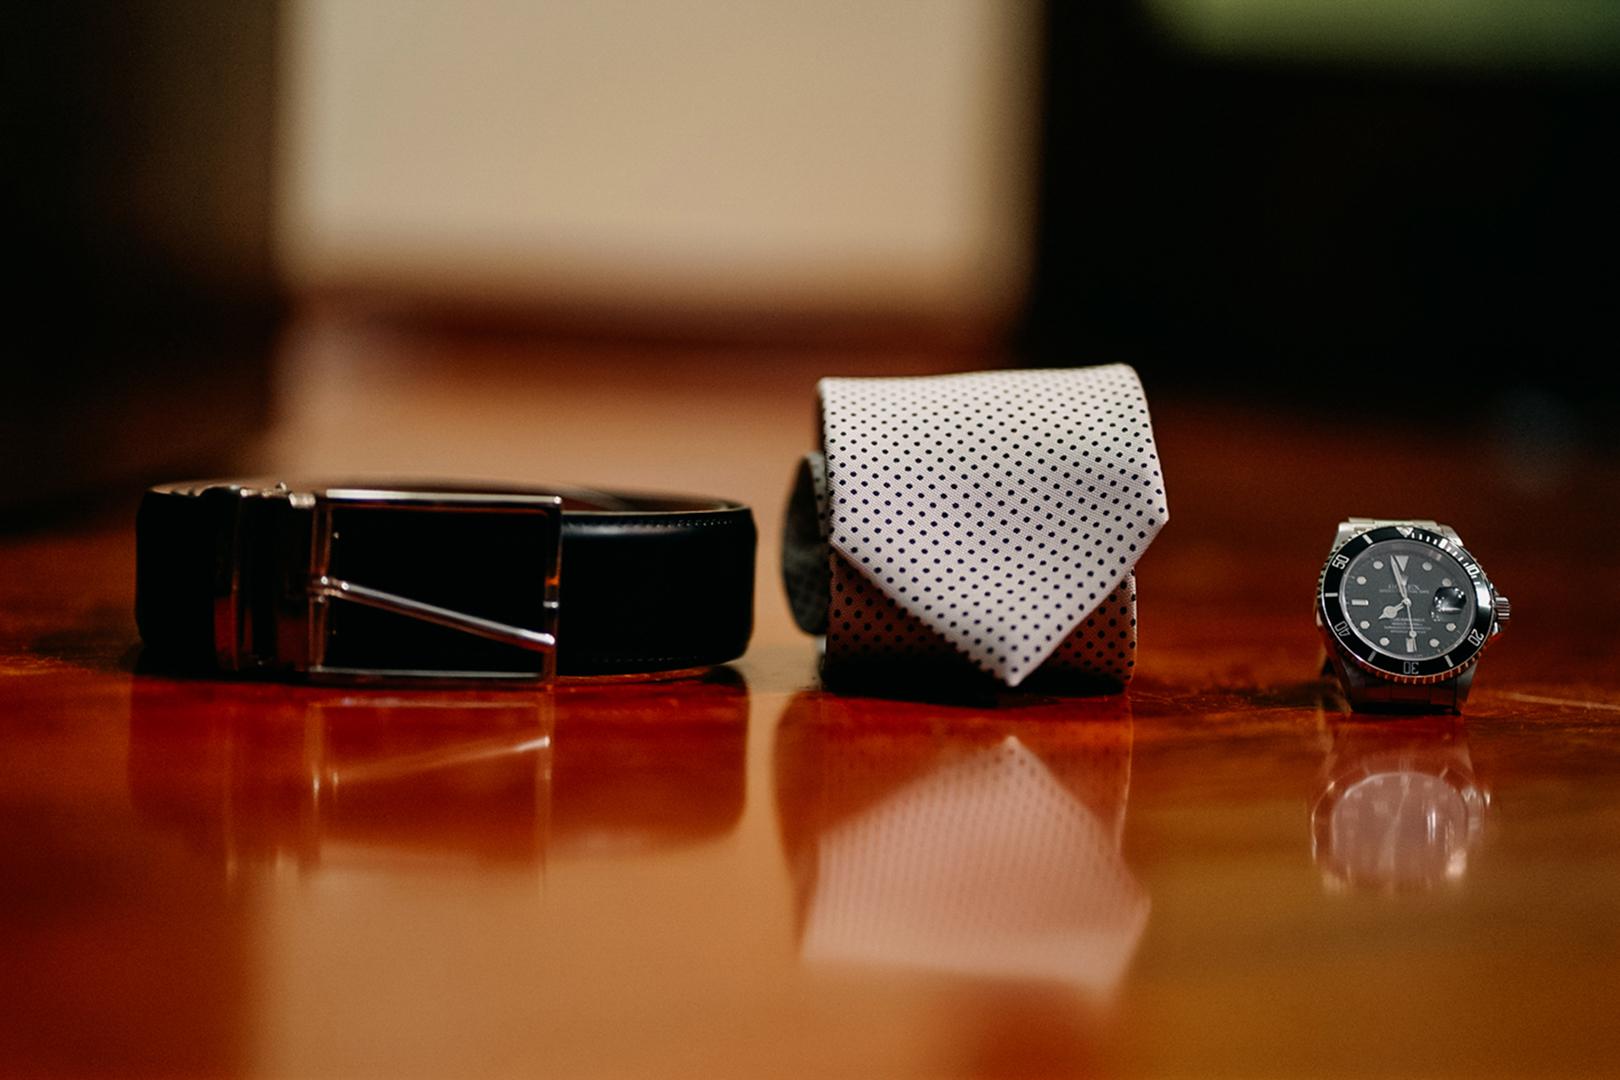 2 gianni-lepore-cintura-cravatta-orologio-sposo